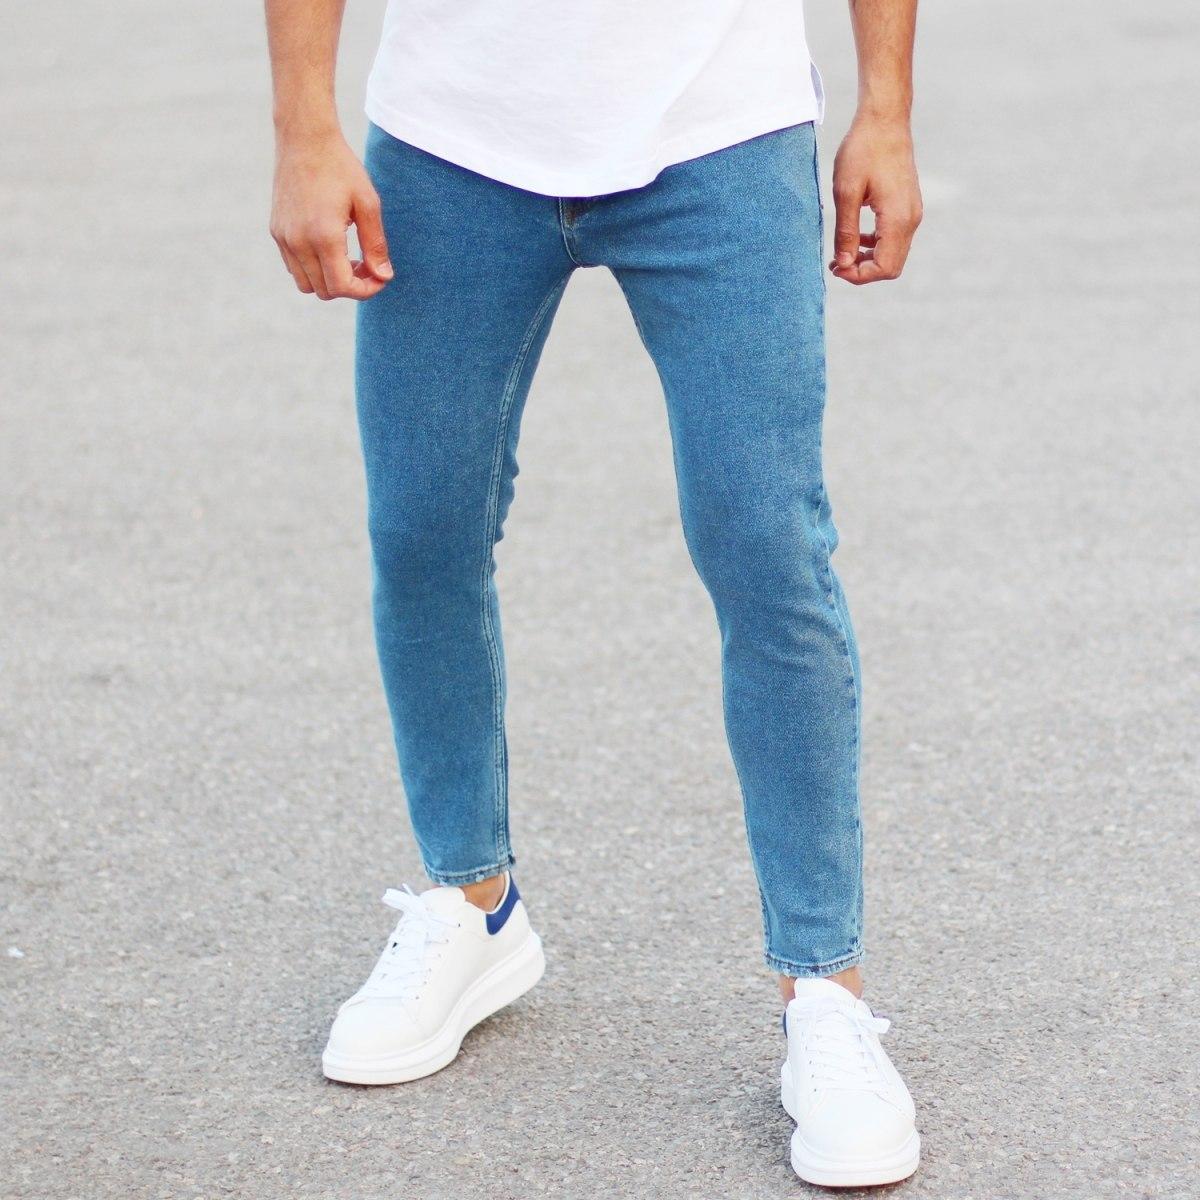 Men's Basic Fit Jeans In Blue Mv Premium Brand - 5